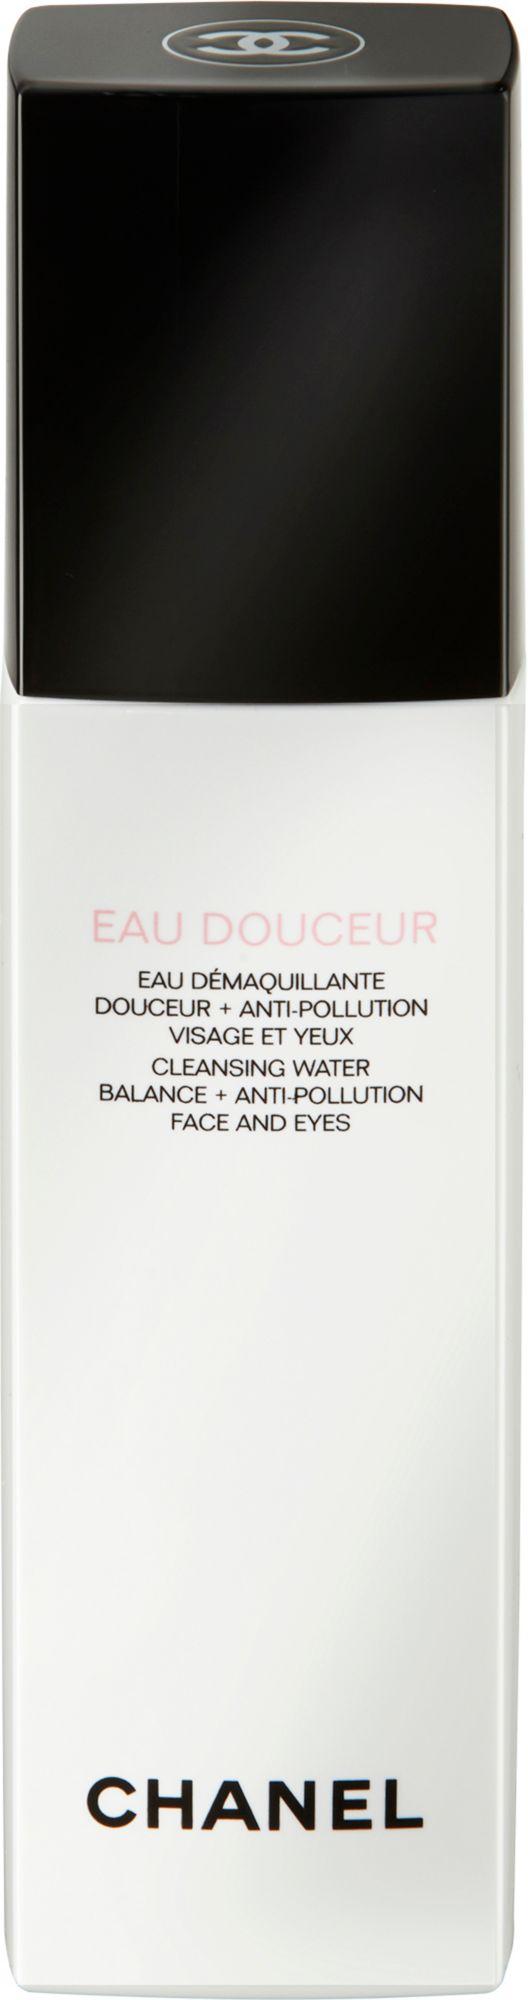 CHANEL Chanel, »Eau Douceur«, Gesichtwasser